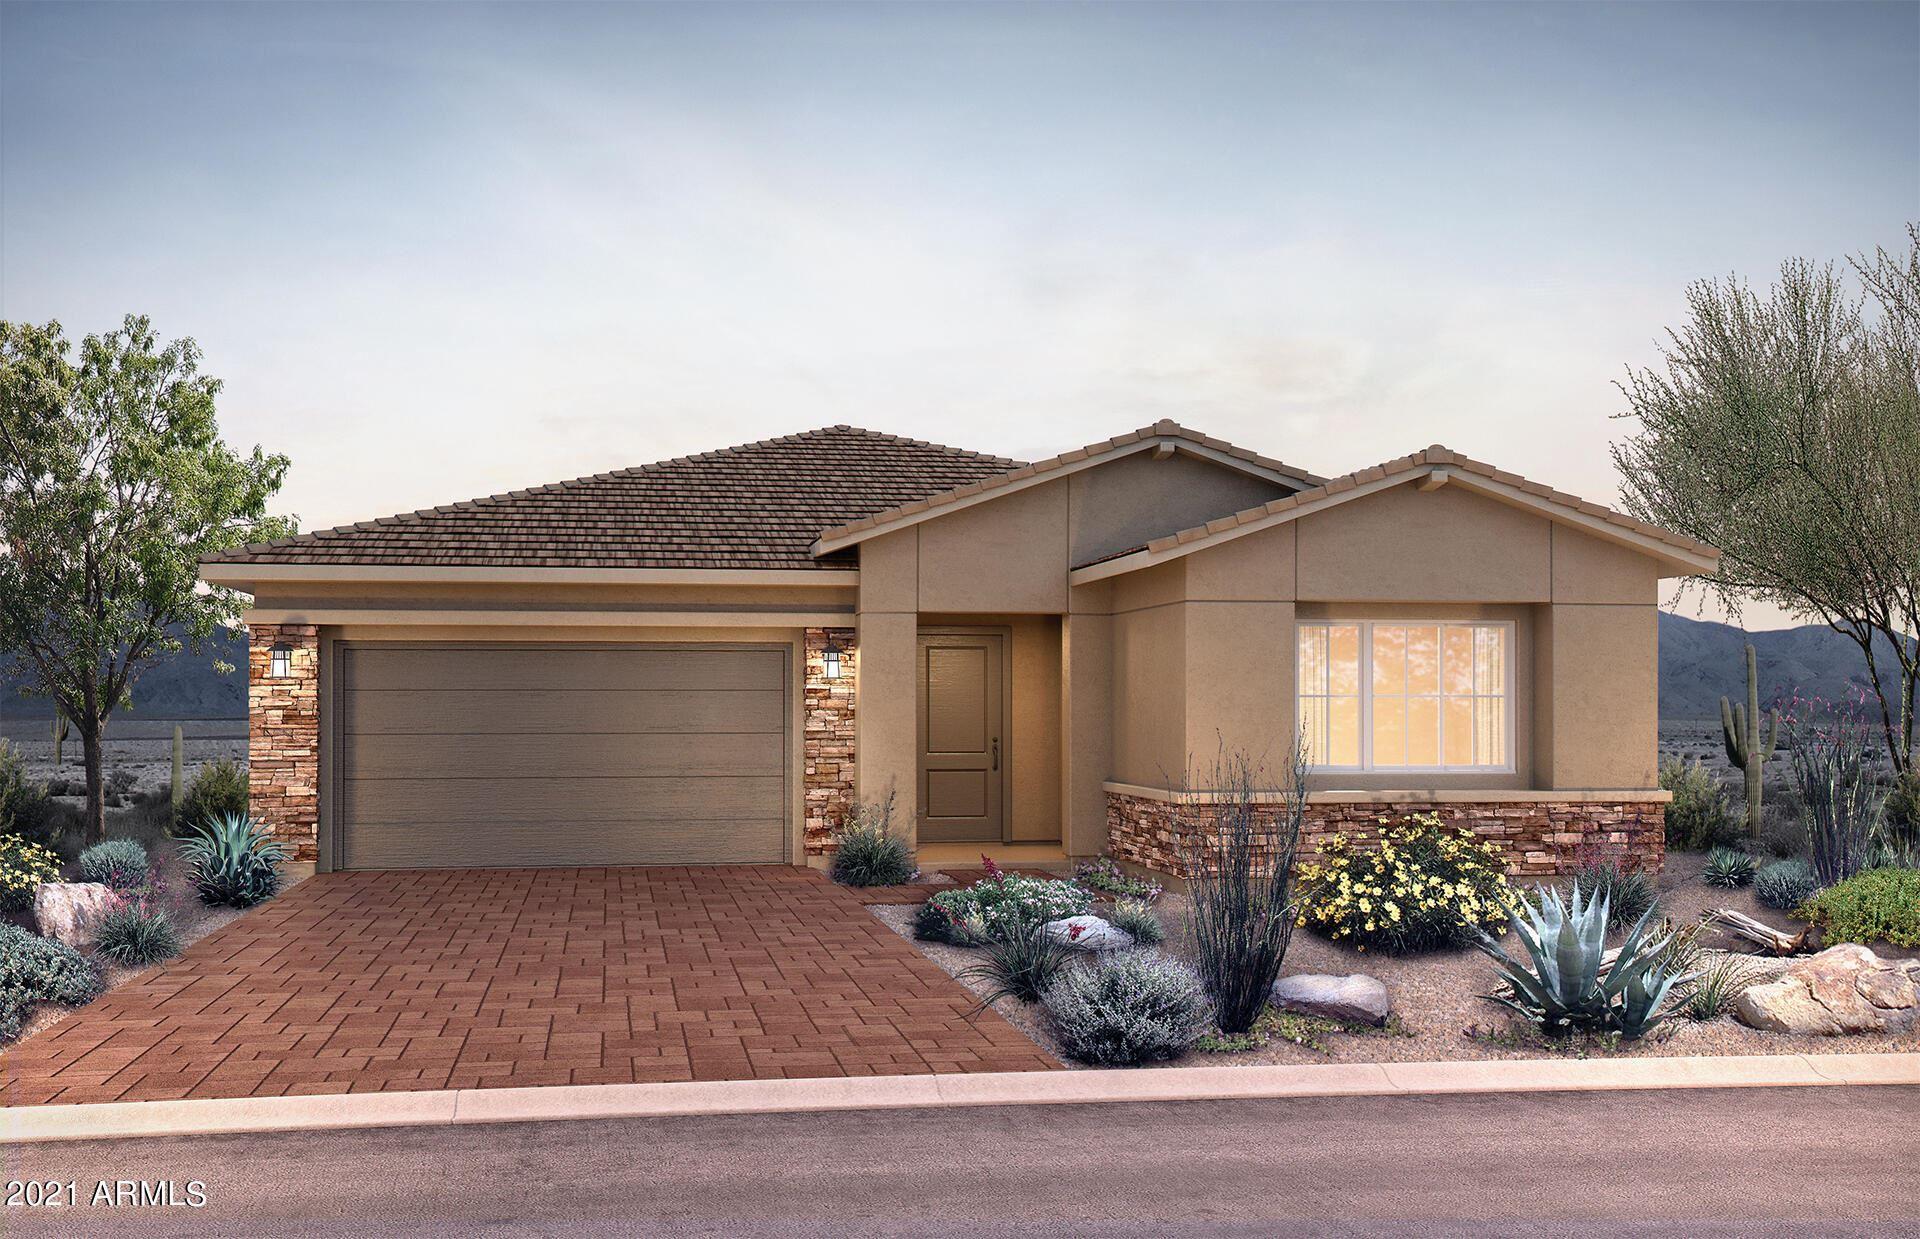 2851 E LOS GATOS Drive, Phoenix, AZ 85050 - MLS#: 6267646